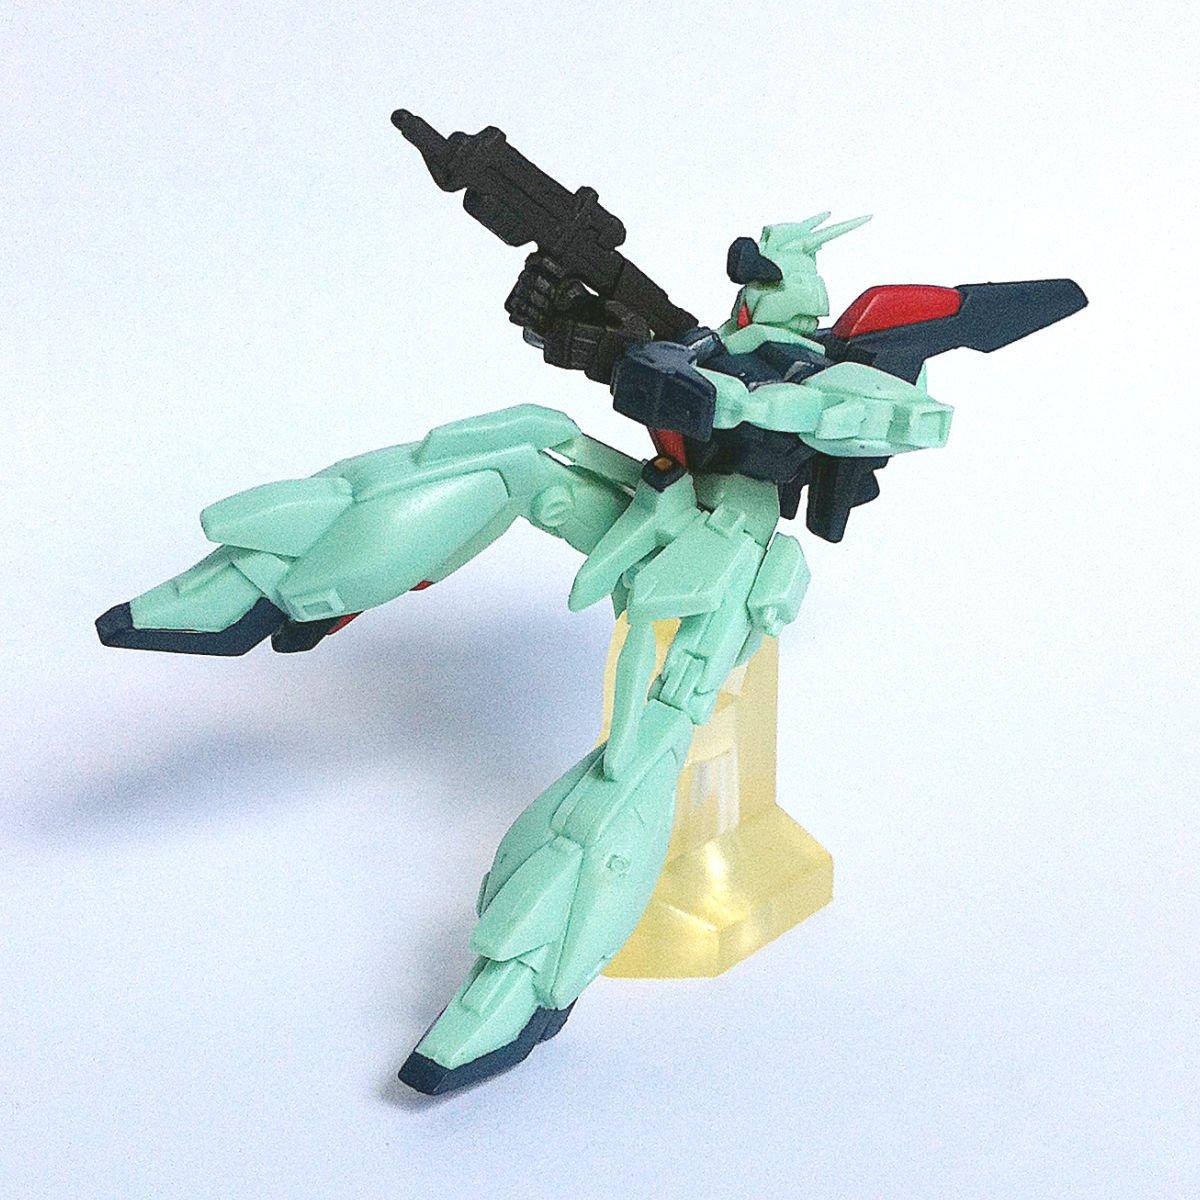 RGZ-91 Re-GZ from HG Gundam MS Selection by Bandai